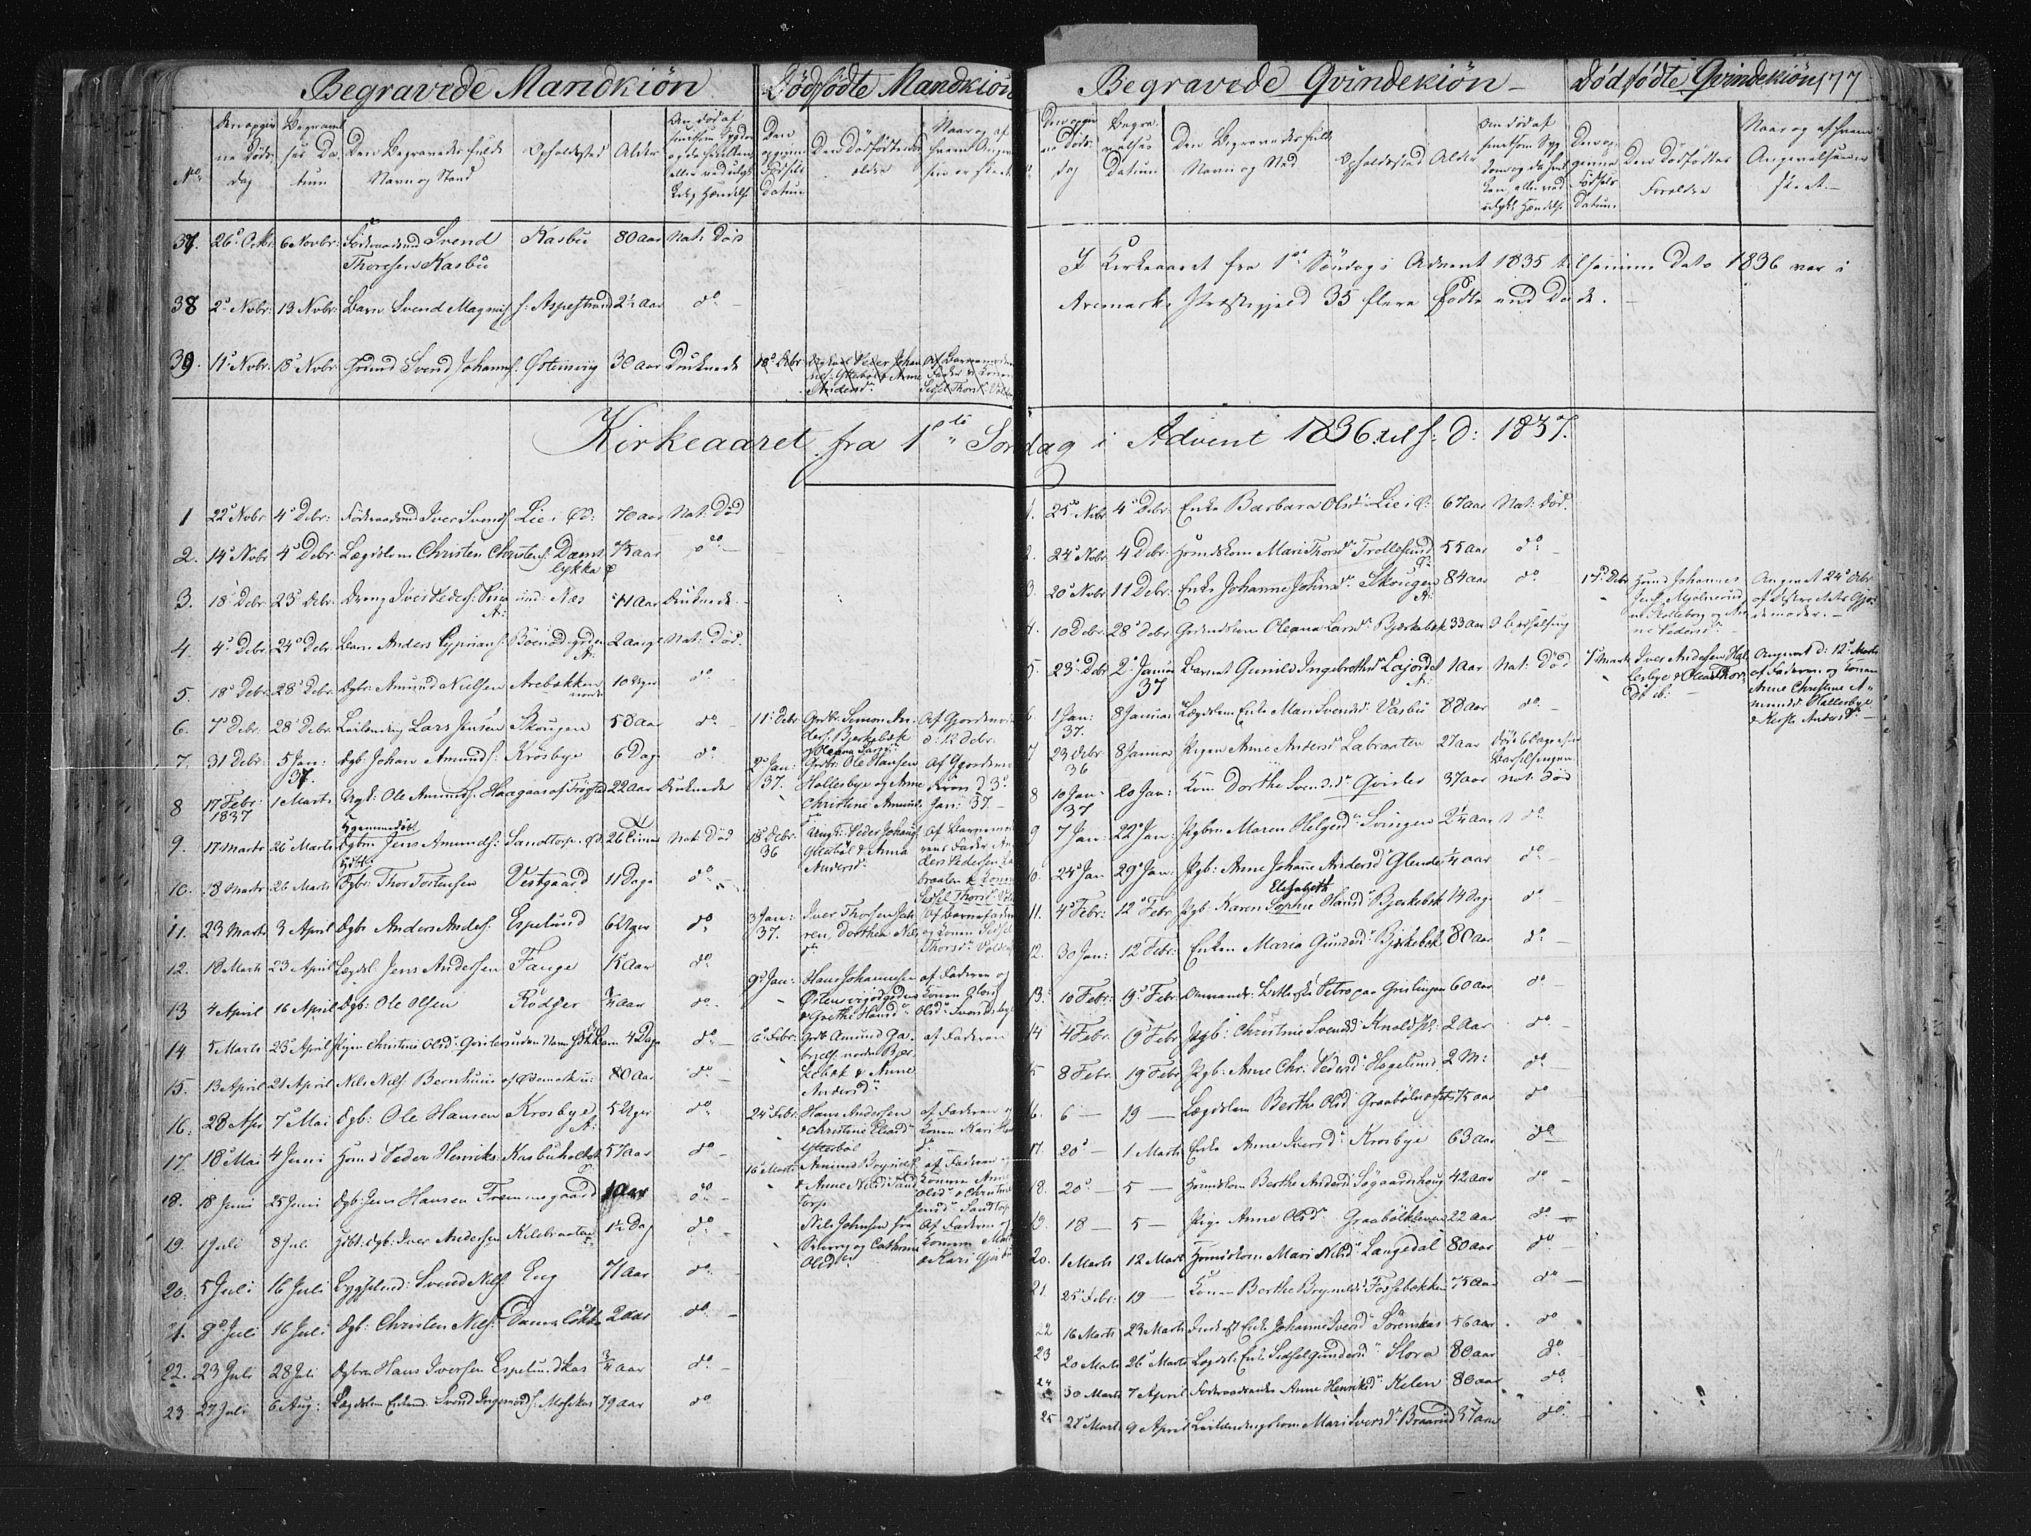 SAO, Aremark prestekontor Kirkebøker, F/Fc/L0002: Ministerialbok nr. III 2, 1834-1849, s. 177